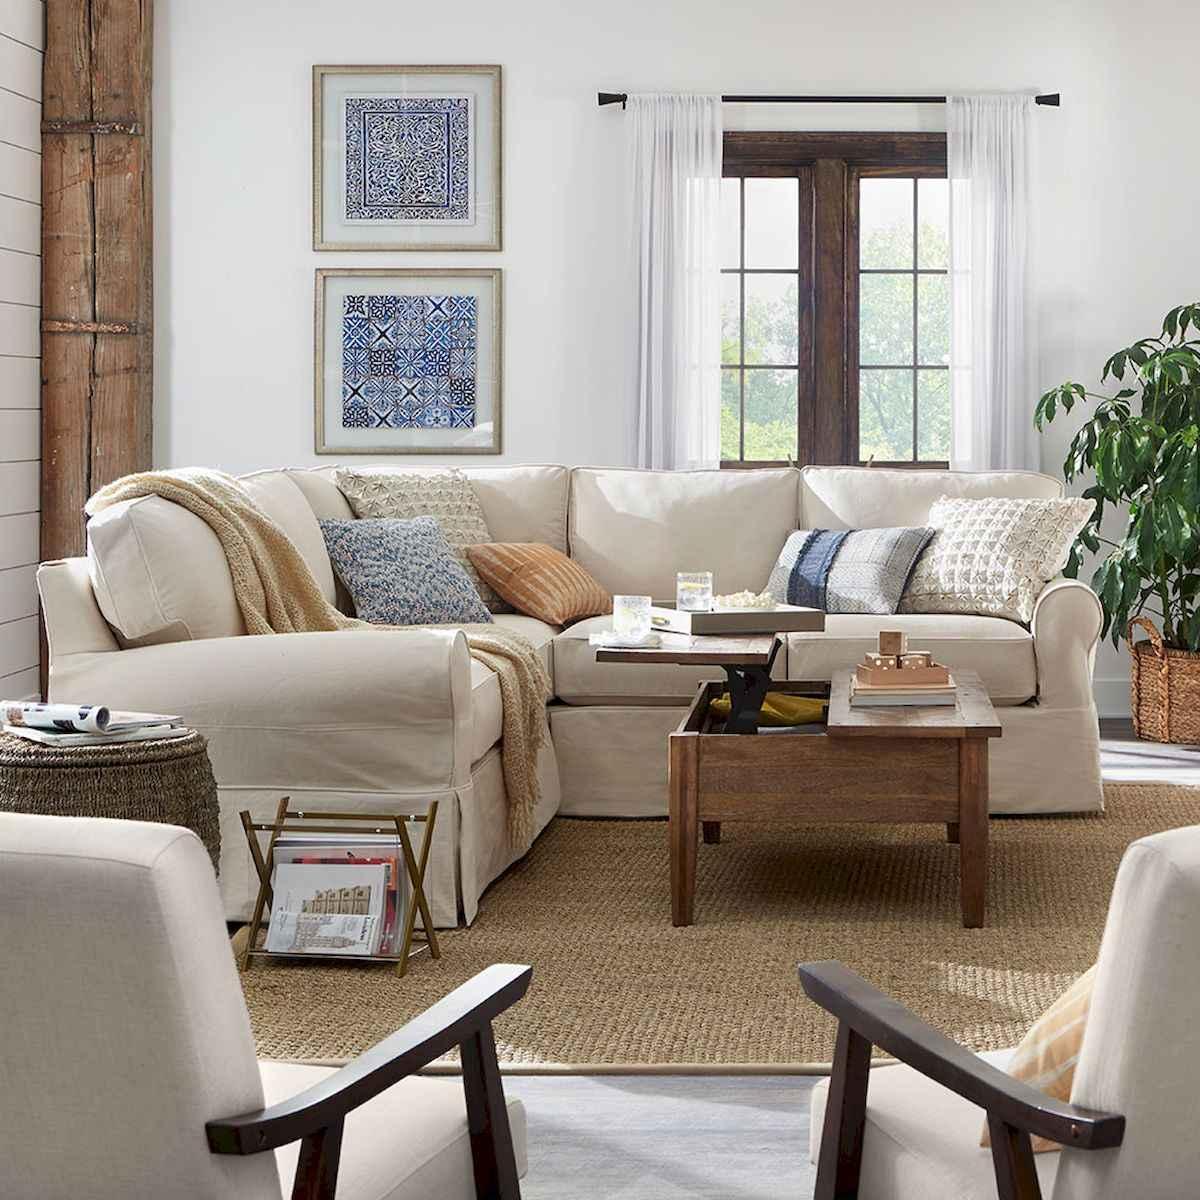 50 Rustic Farmhouse Living Room Decor Ideas (6)